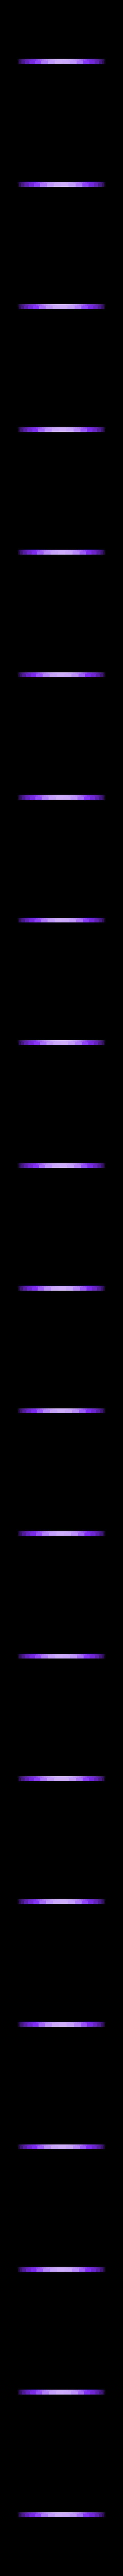 wd2.stl Download free STL file Logo Watch Dogs • 3D print design, Arnaud1